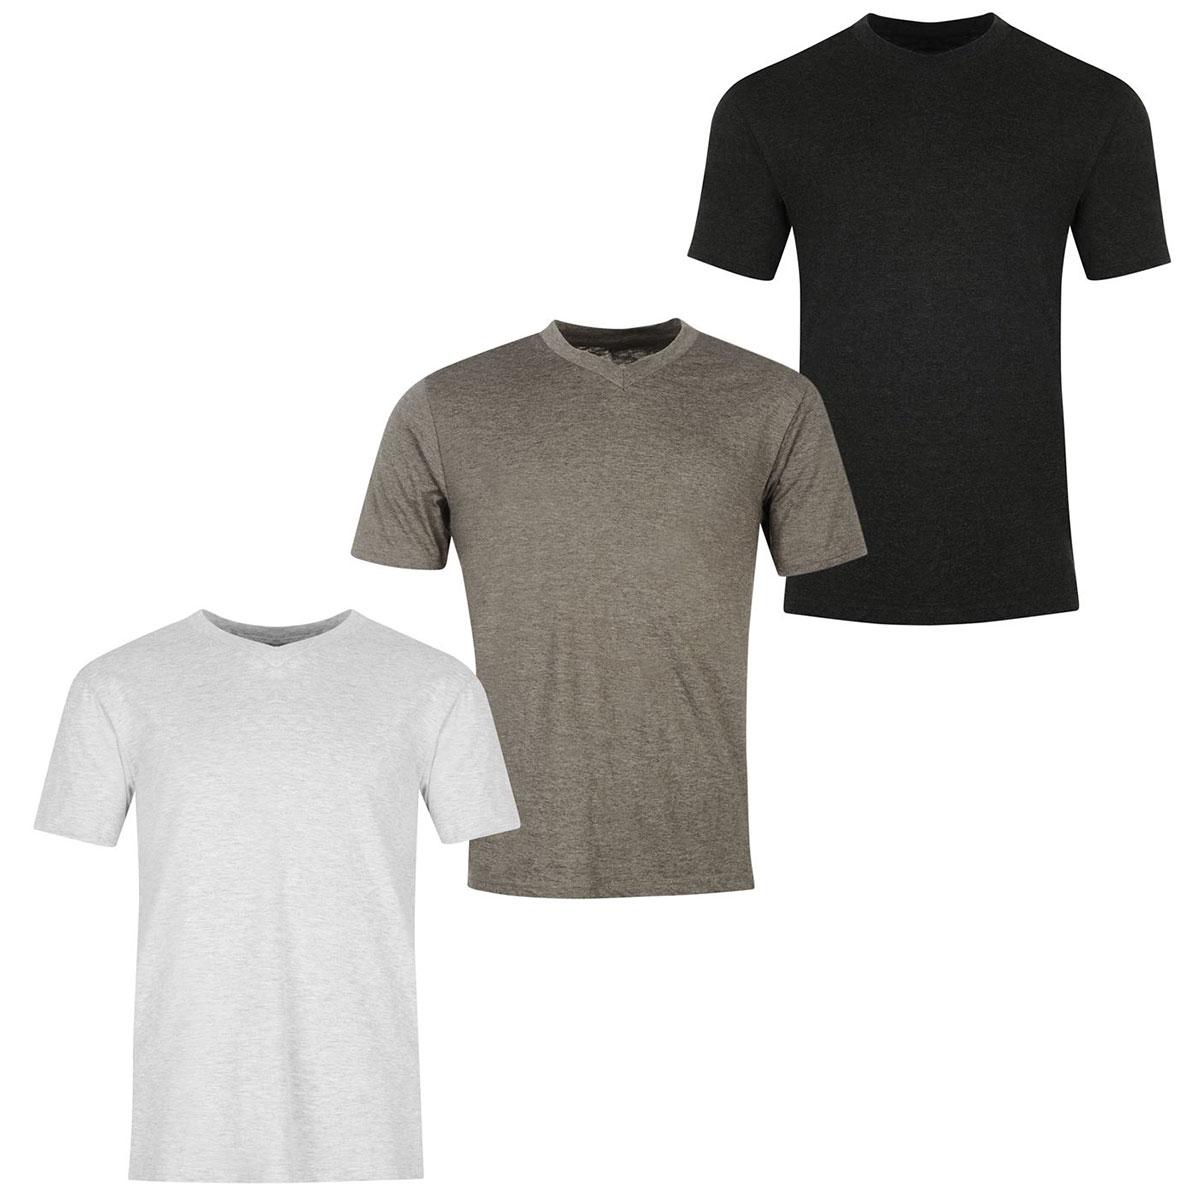 Donnay Men's V-Neck Short-Sleeve Tees, 3-Pack - Black, 3XL